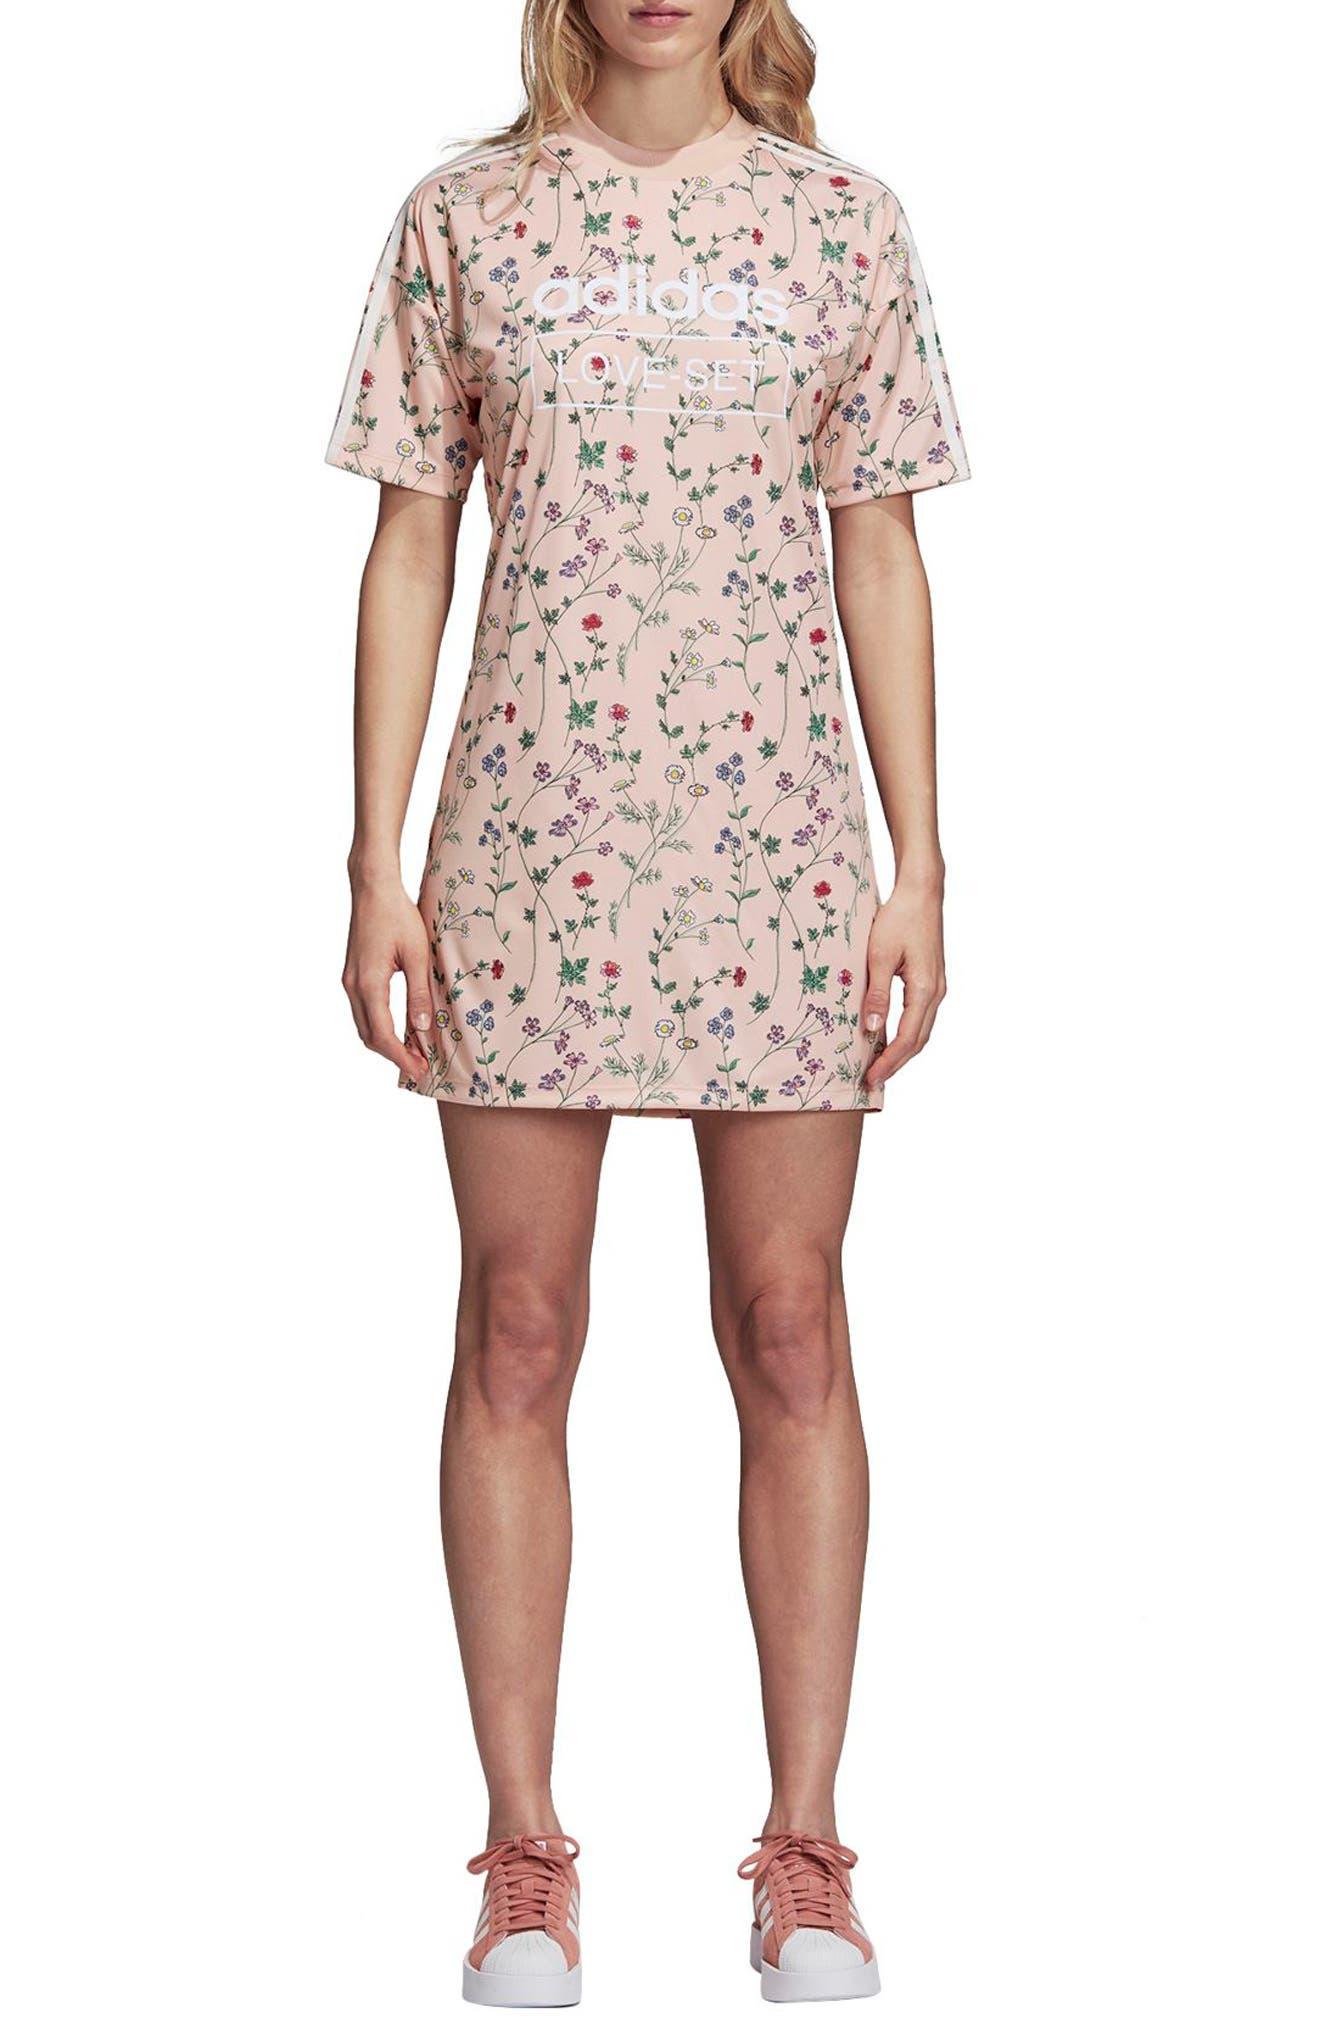 adidas Originals Floral Graphic Dress